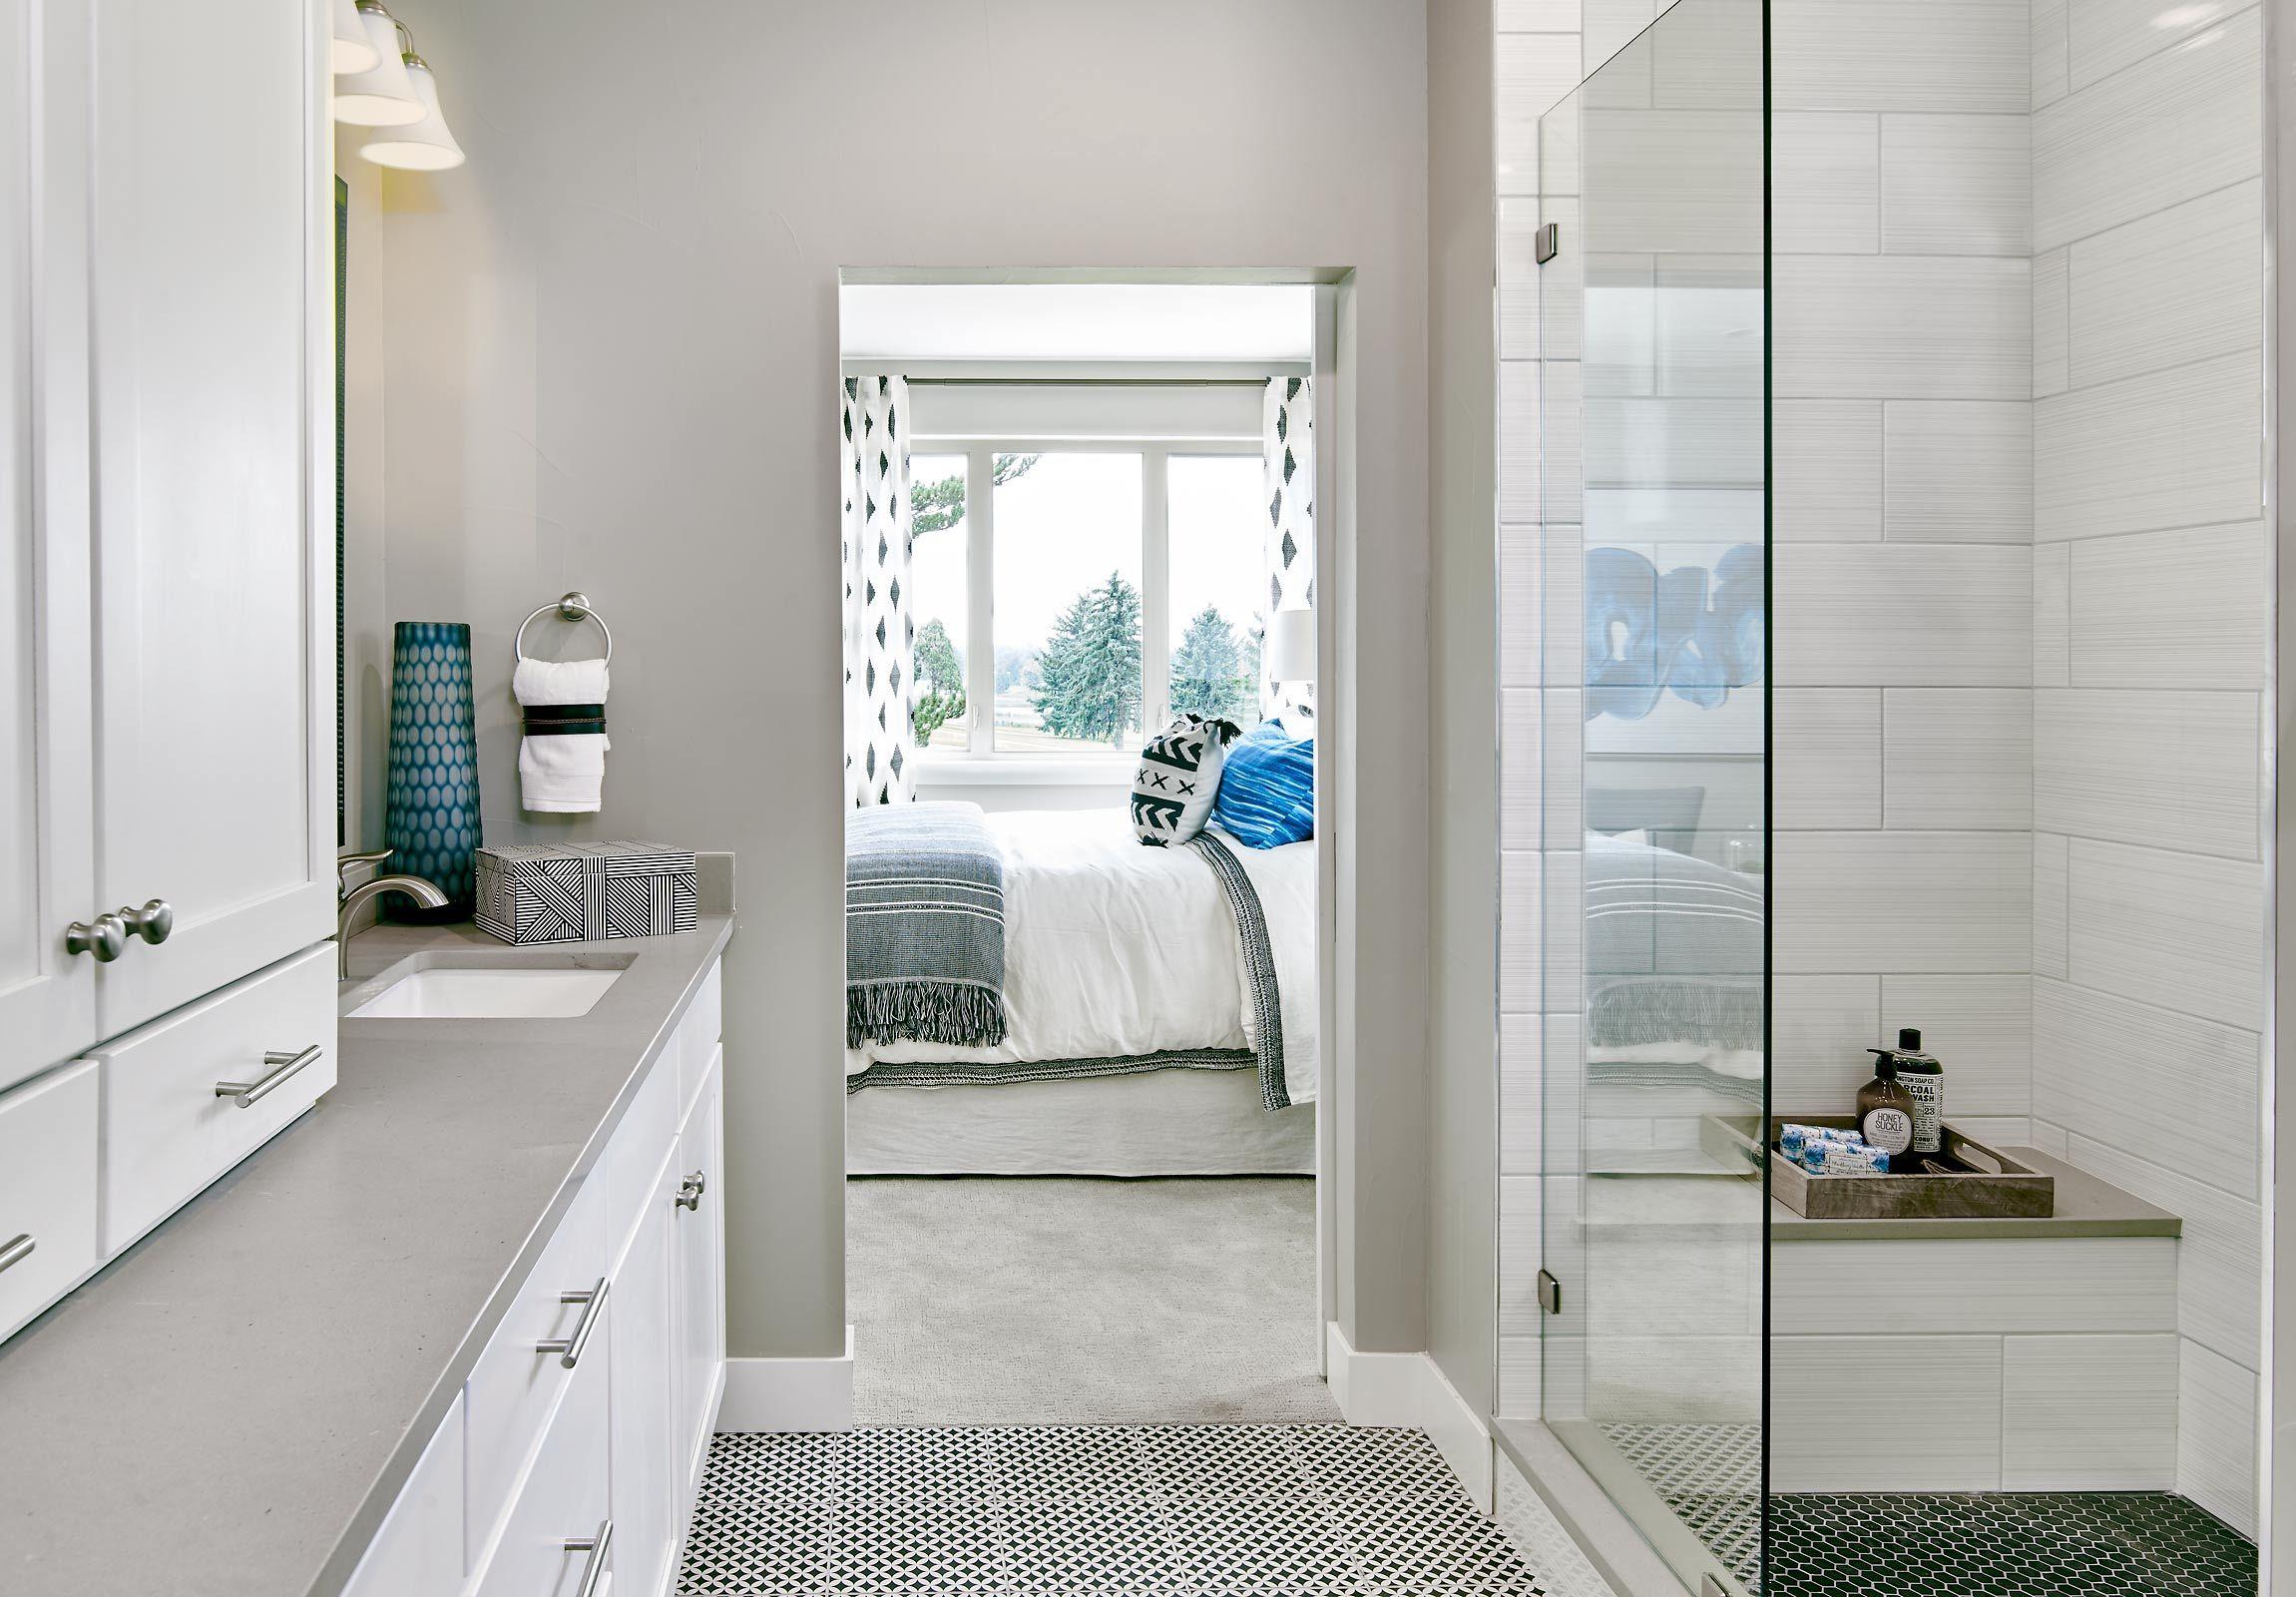 Bathroom featured in the Flatiron By Koelbel Urban Homes in Denver, CO